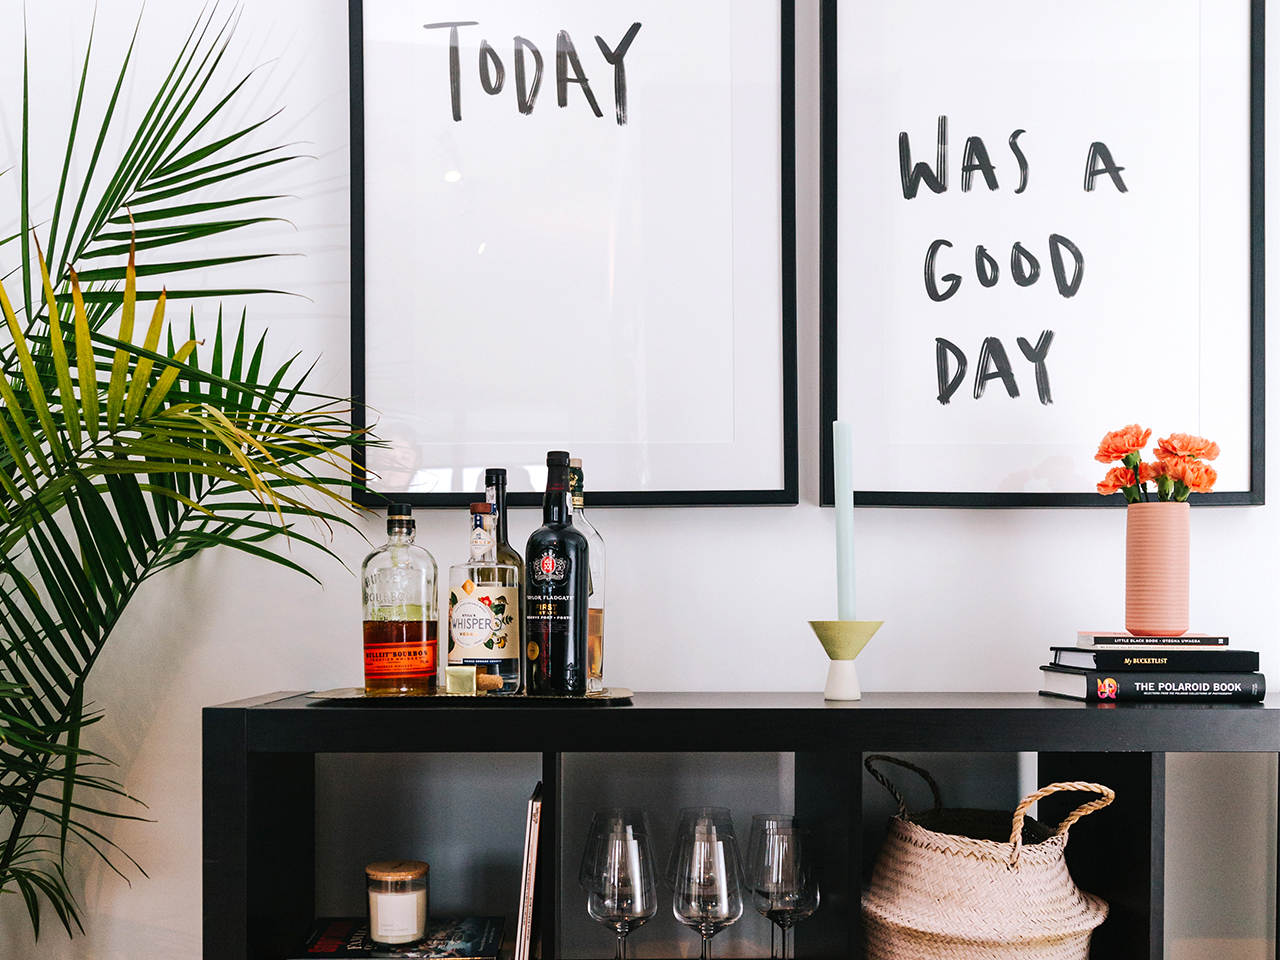 Small space ideas: The Home Primp corner makeover